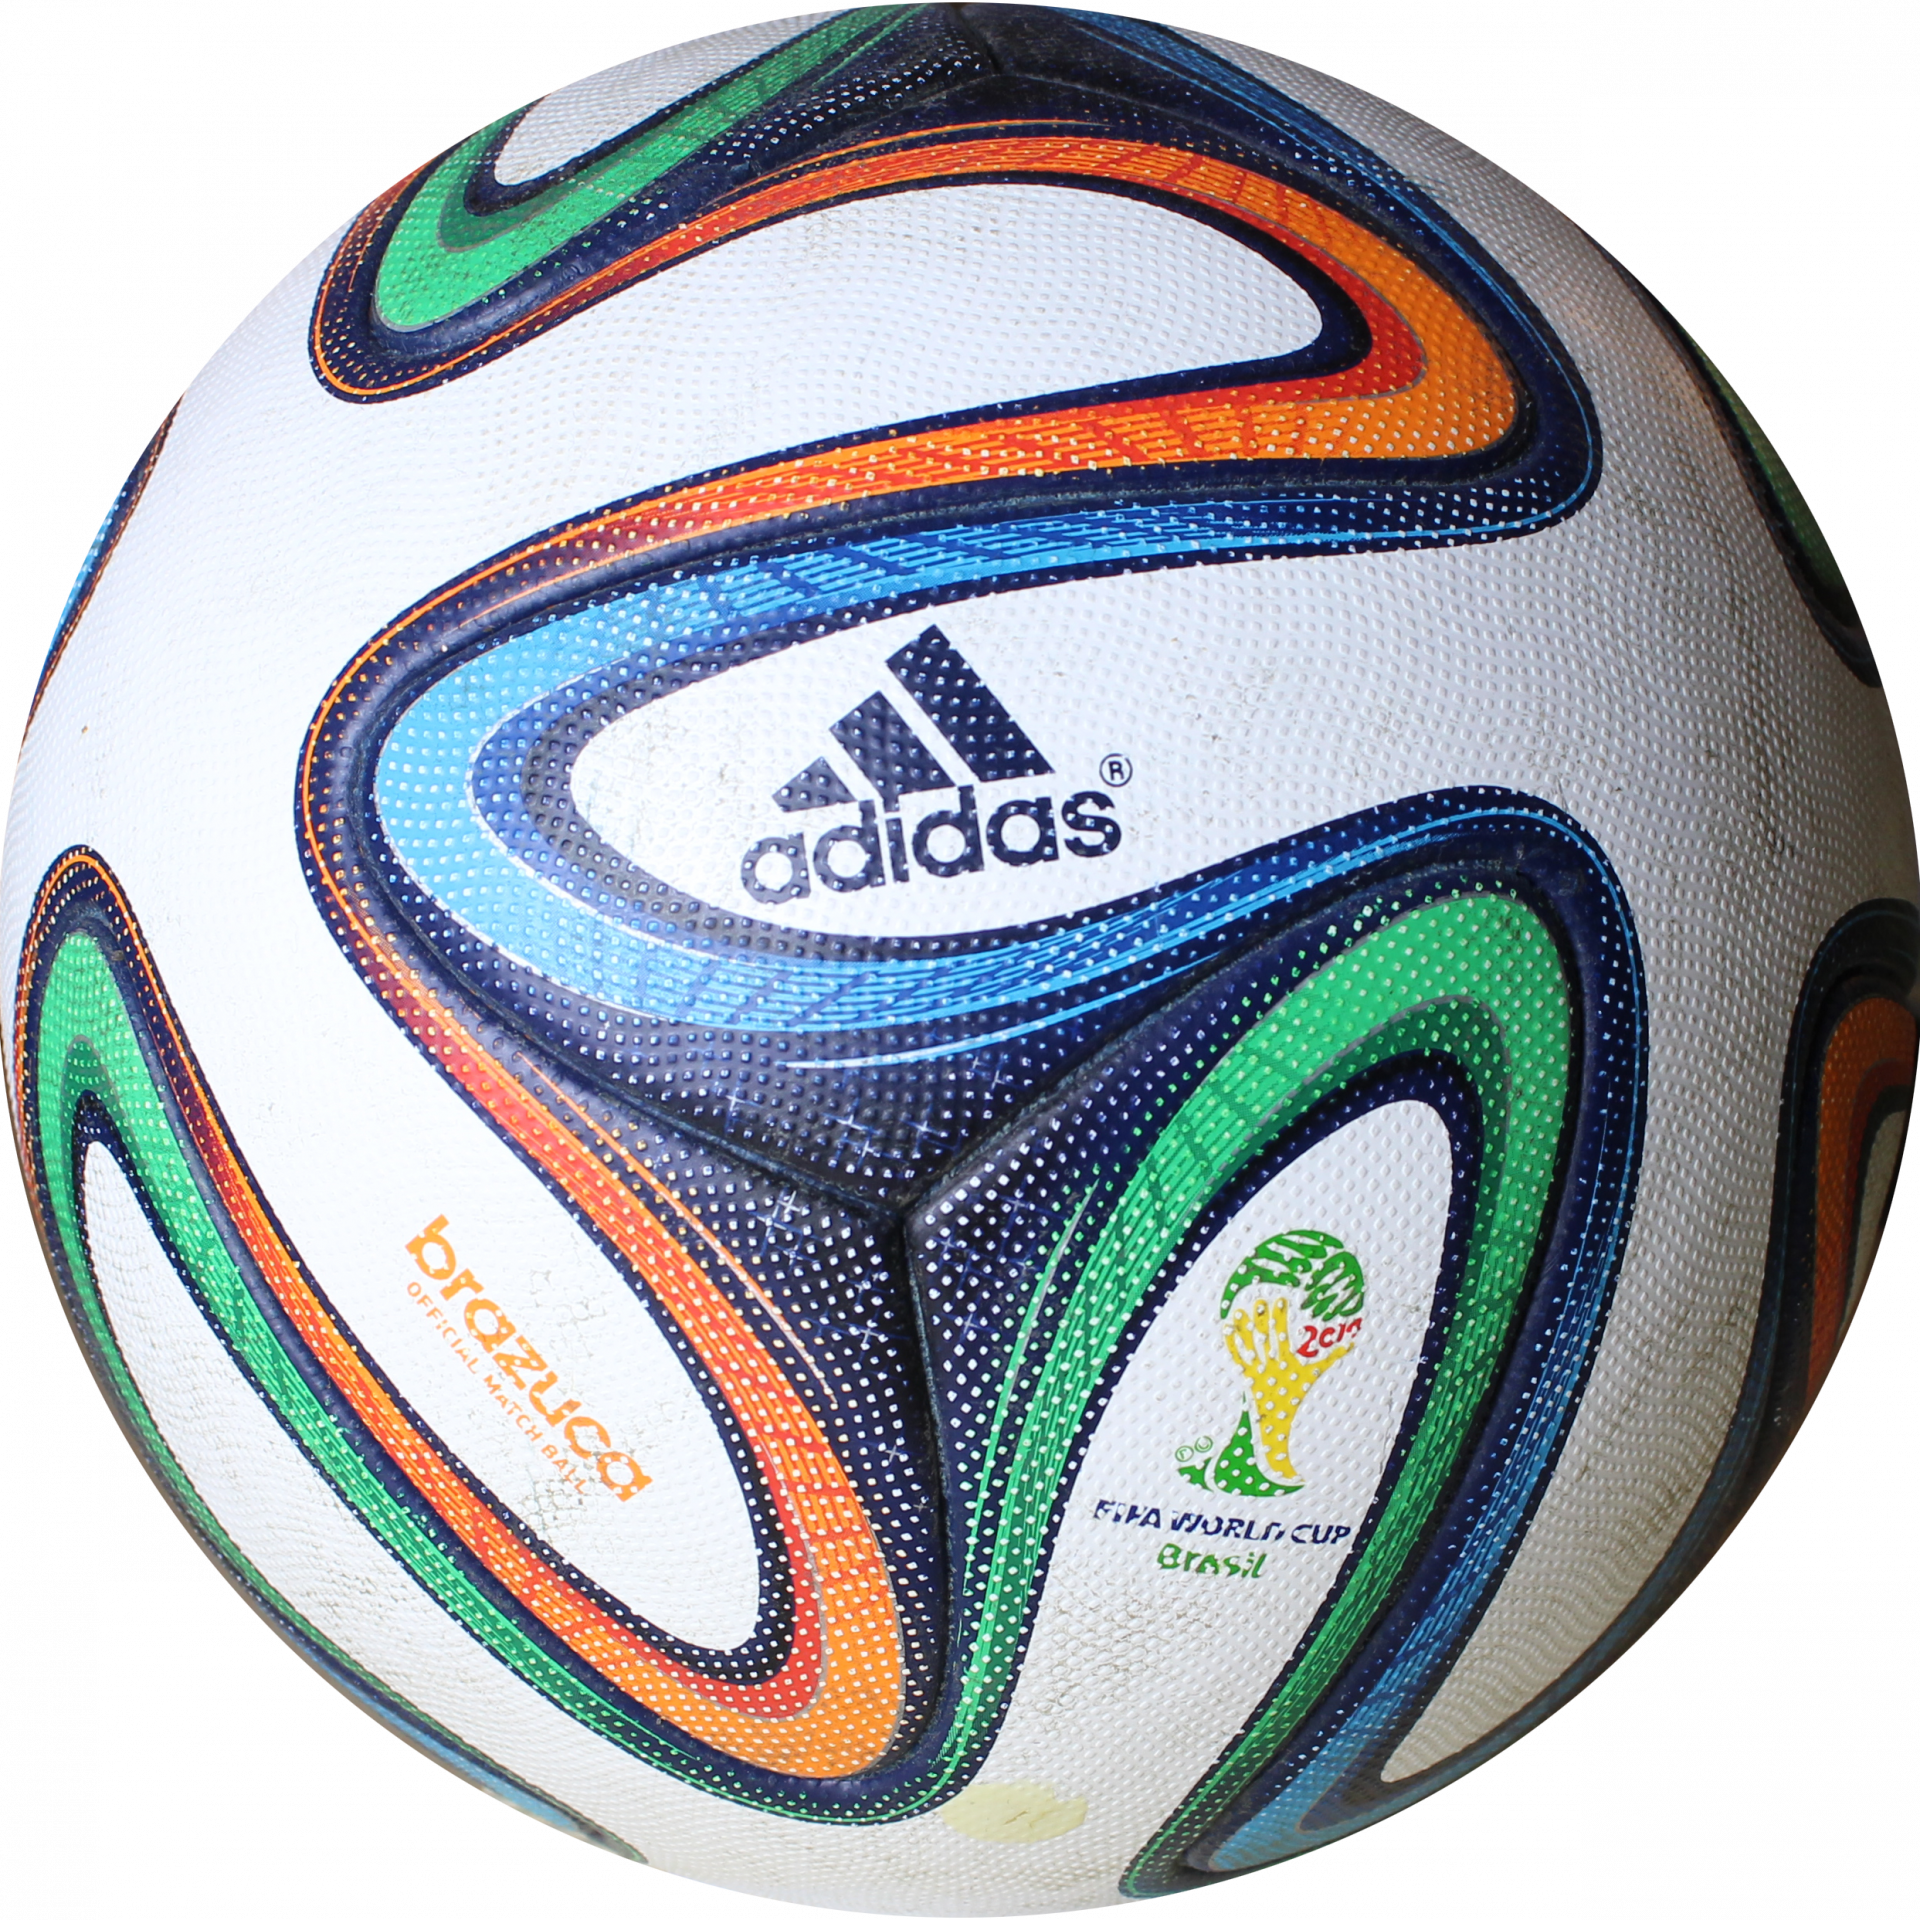 Adidas brazuca 2014 OMB